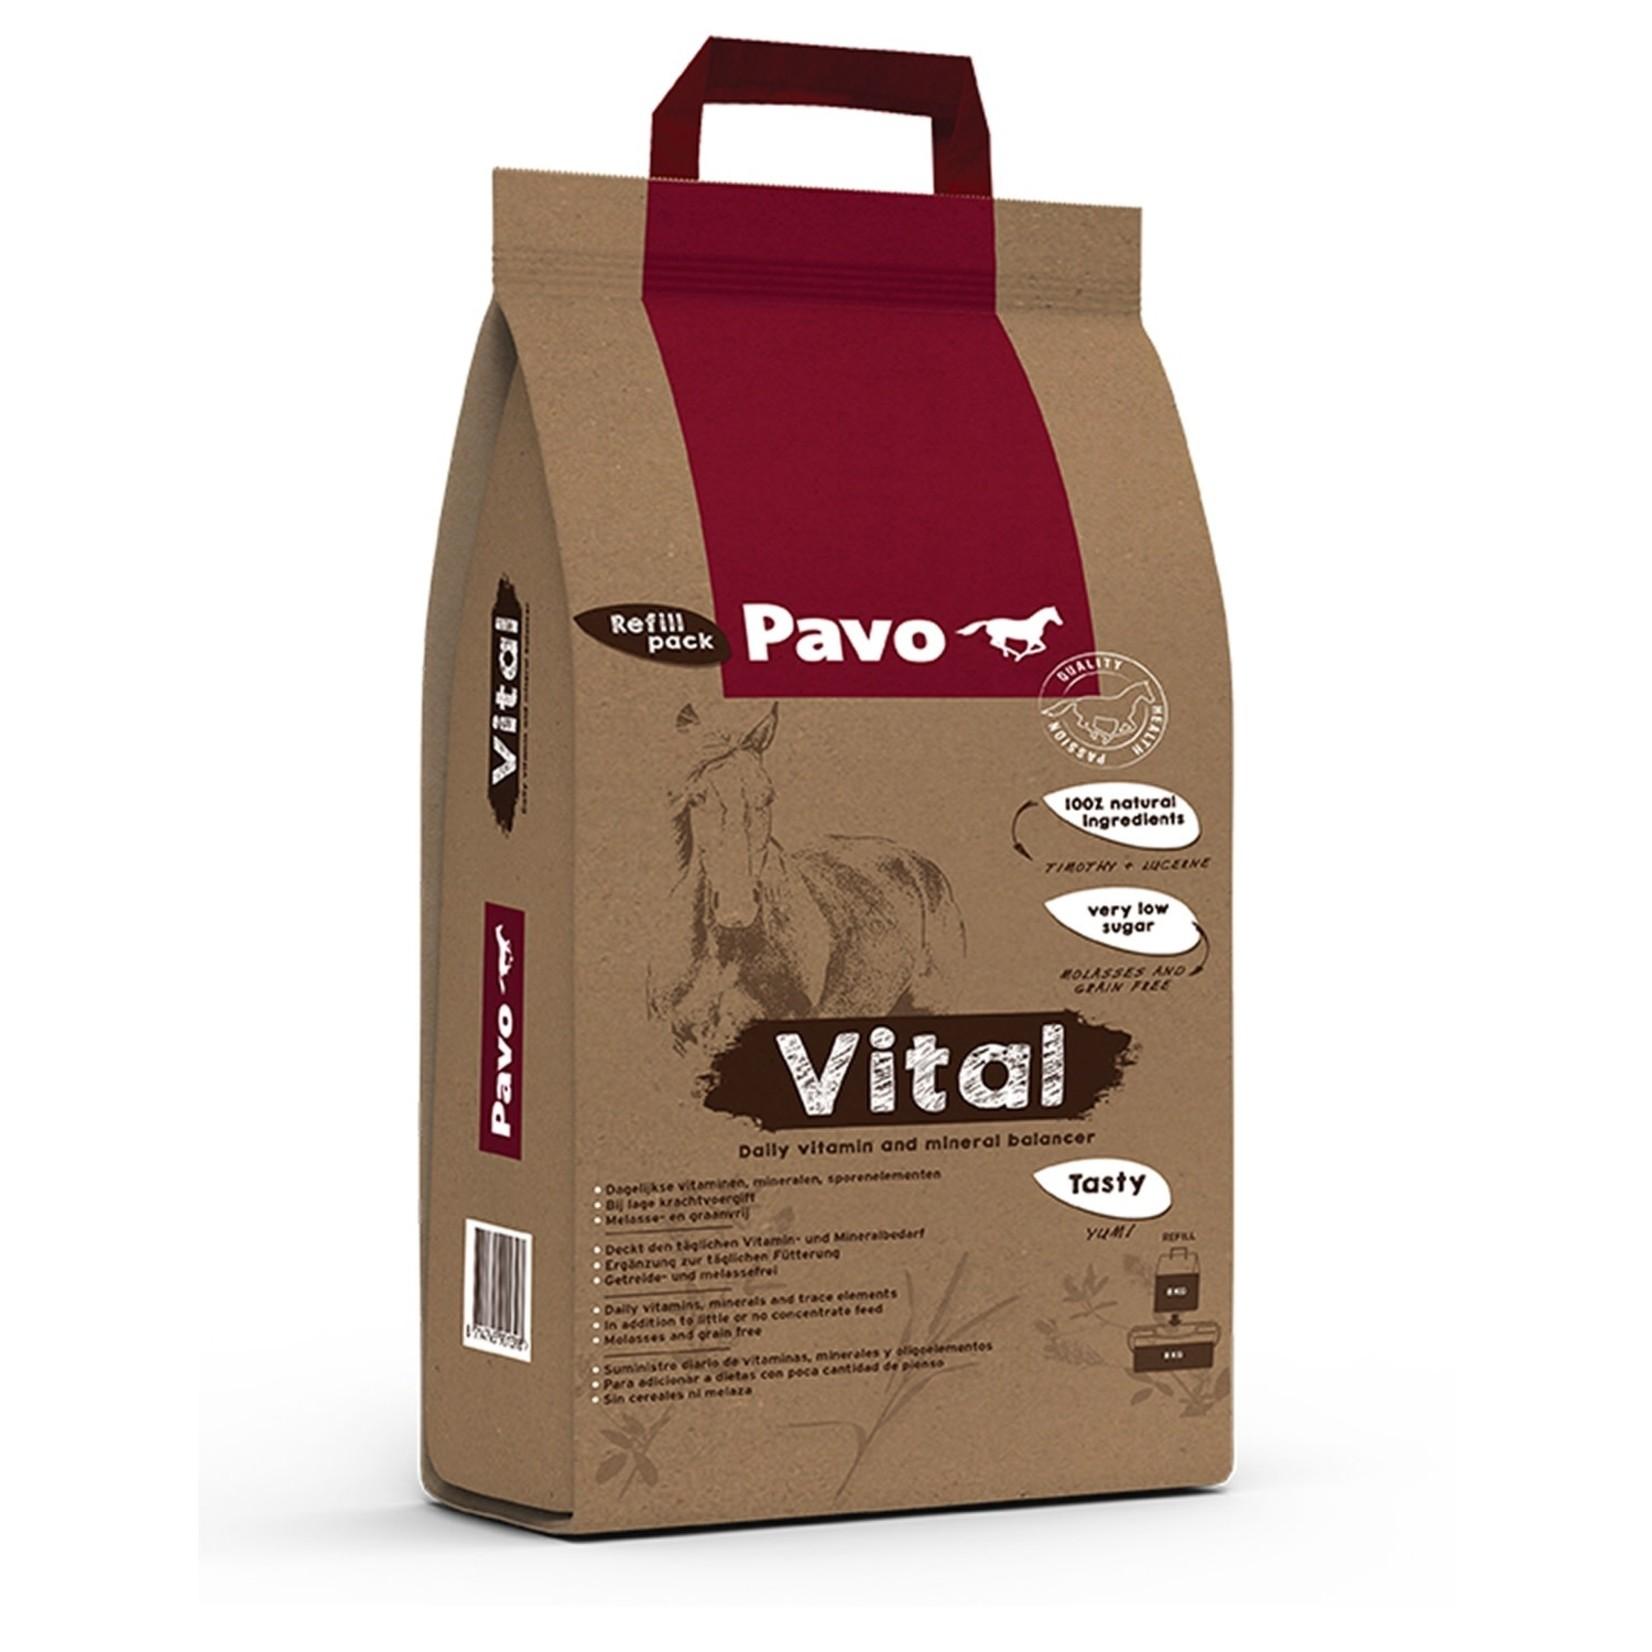 Pavo Pavo Vital 8 KG (navulling 8 KG)